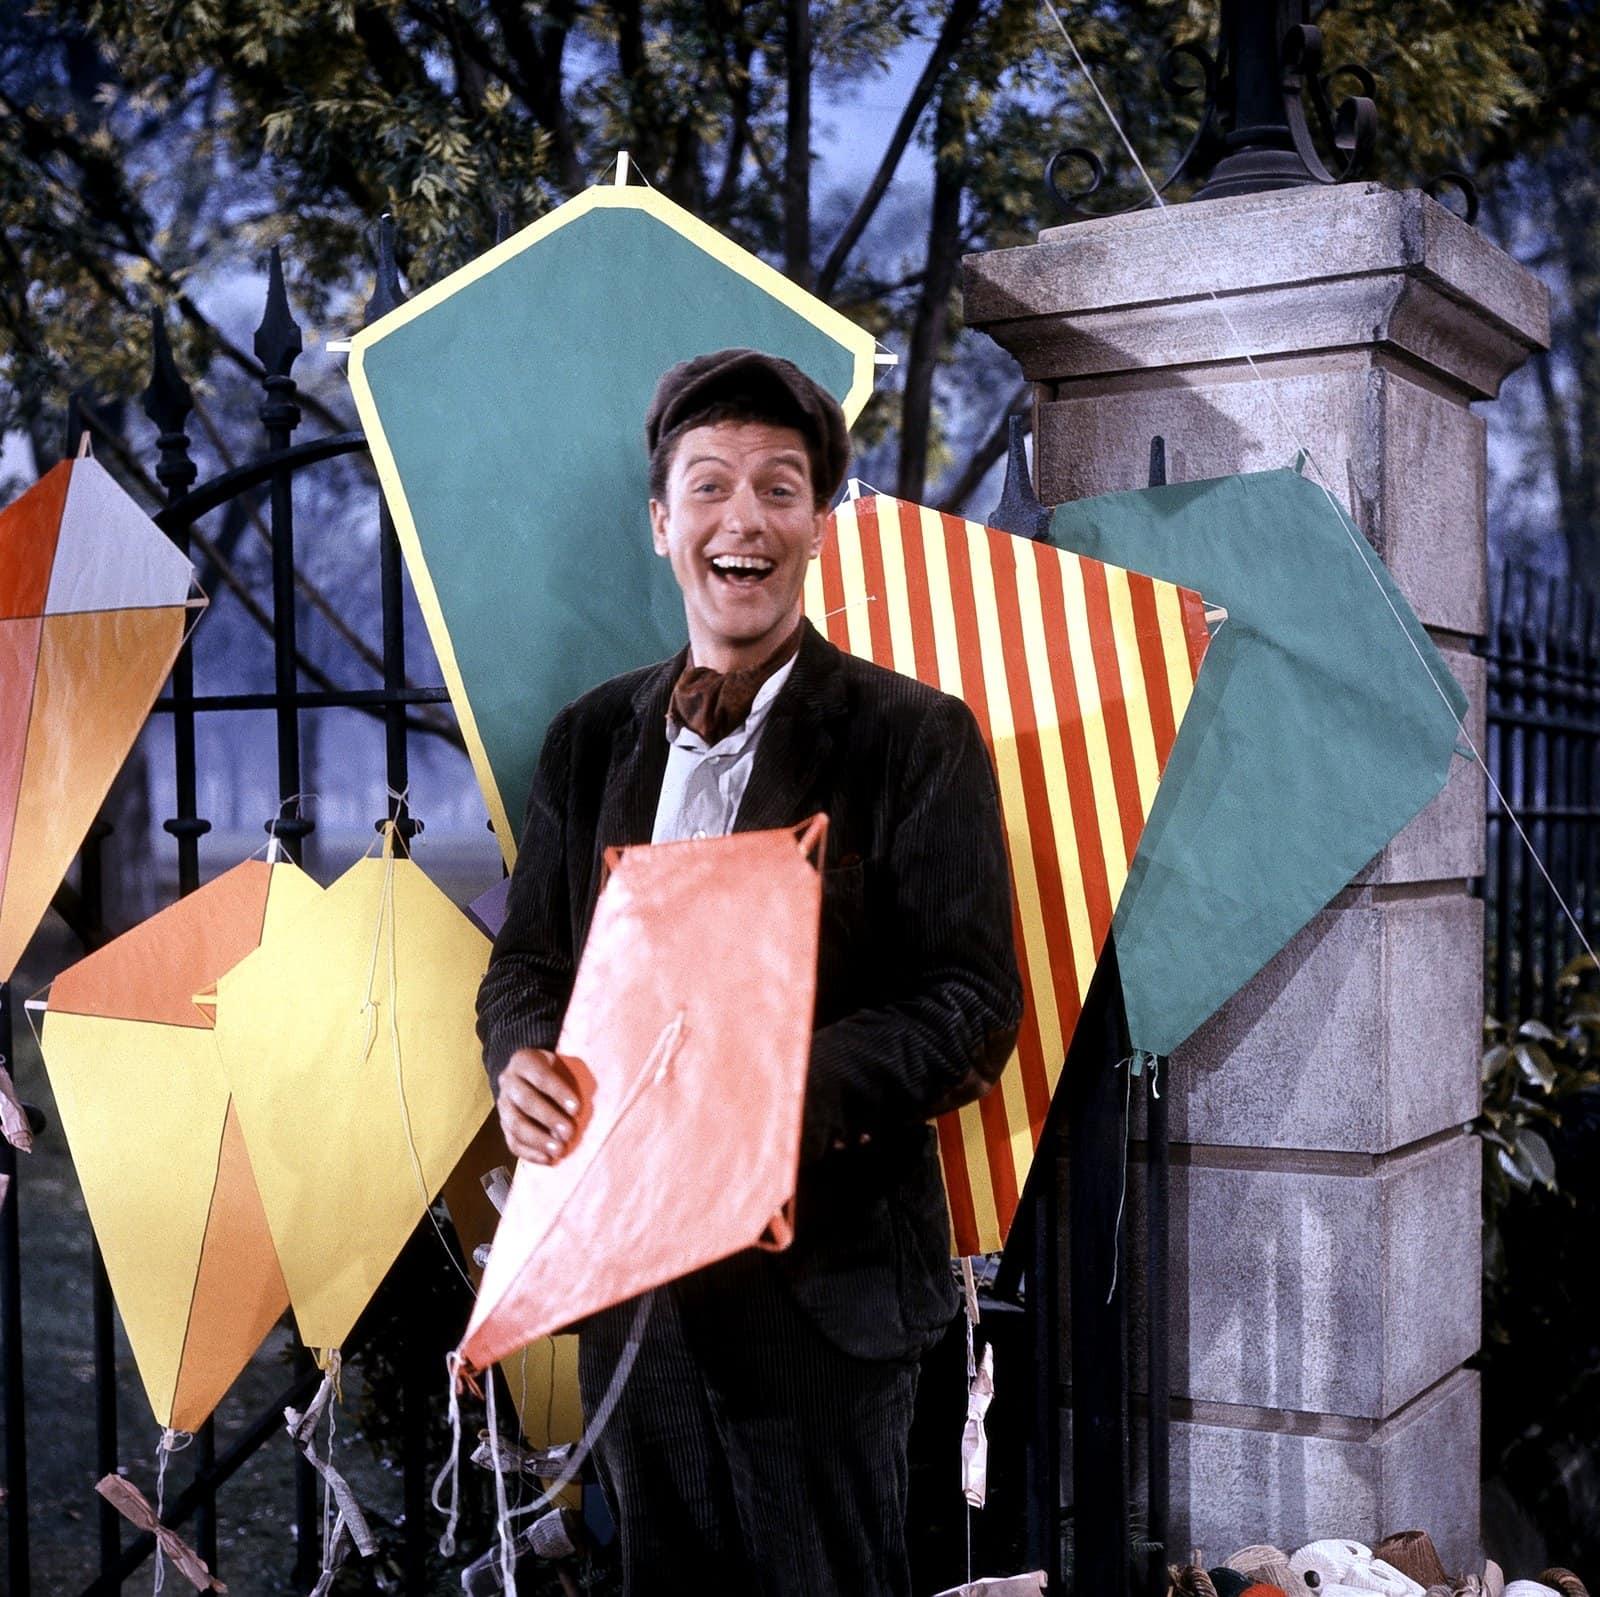 Bert in Disney's 1964 movie Mary Poppins